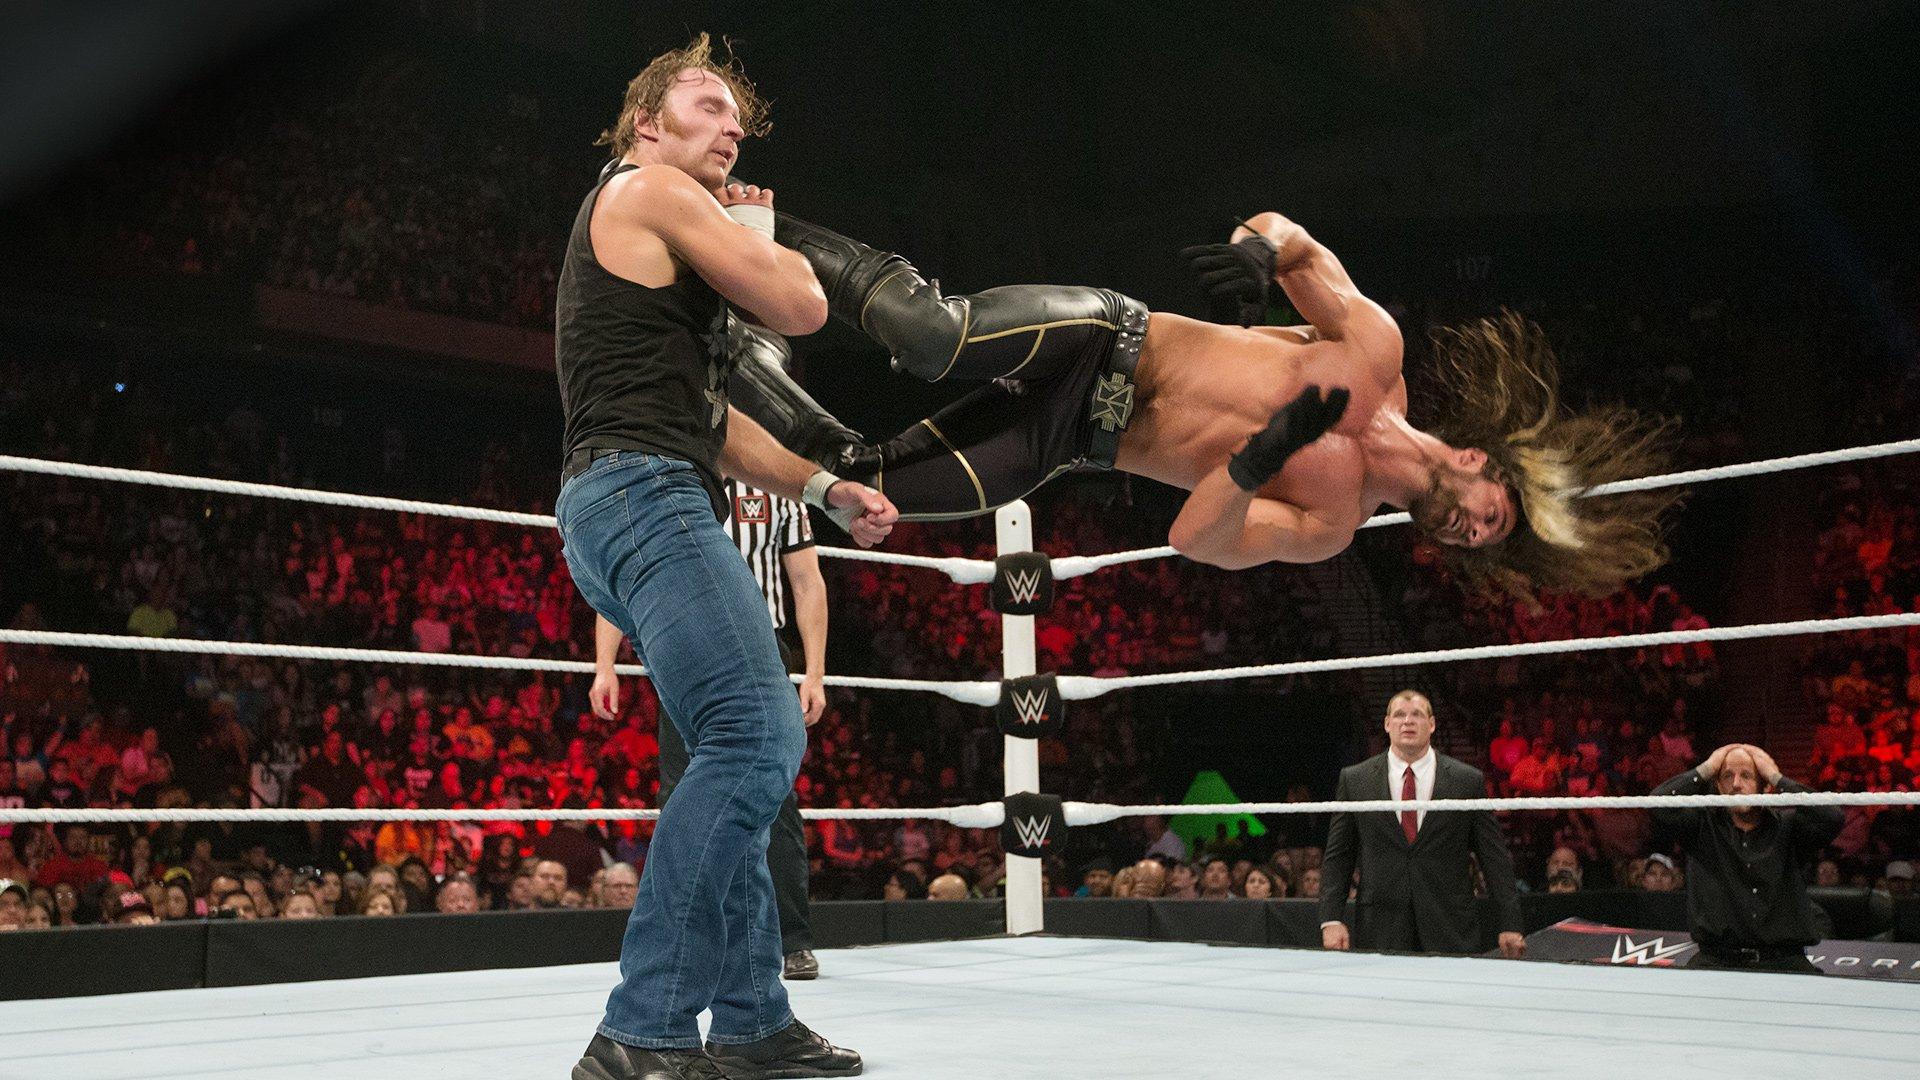 Seth Rollins vs. Dean Ambrose - Match pour le Titre WWE World Heavyweight: WWE Elimination Chamber 2015 (Match Intégral - Exclusivité WWE Network)